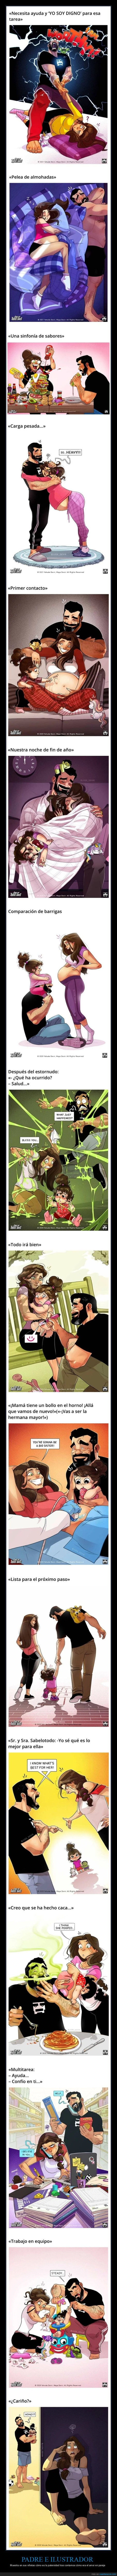 ilustrador,padre,pareja,paternidad